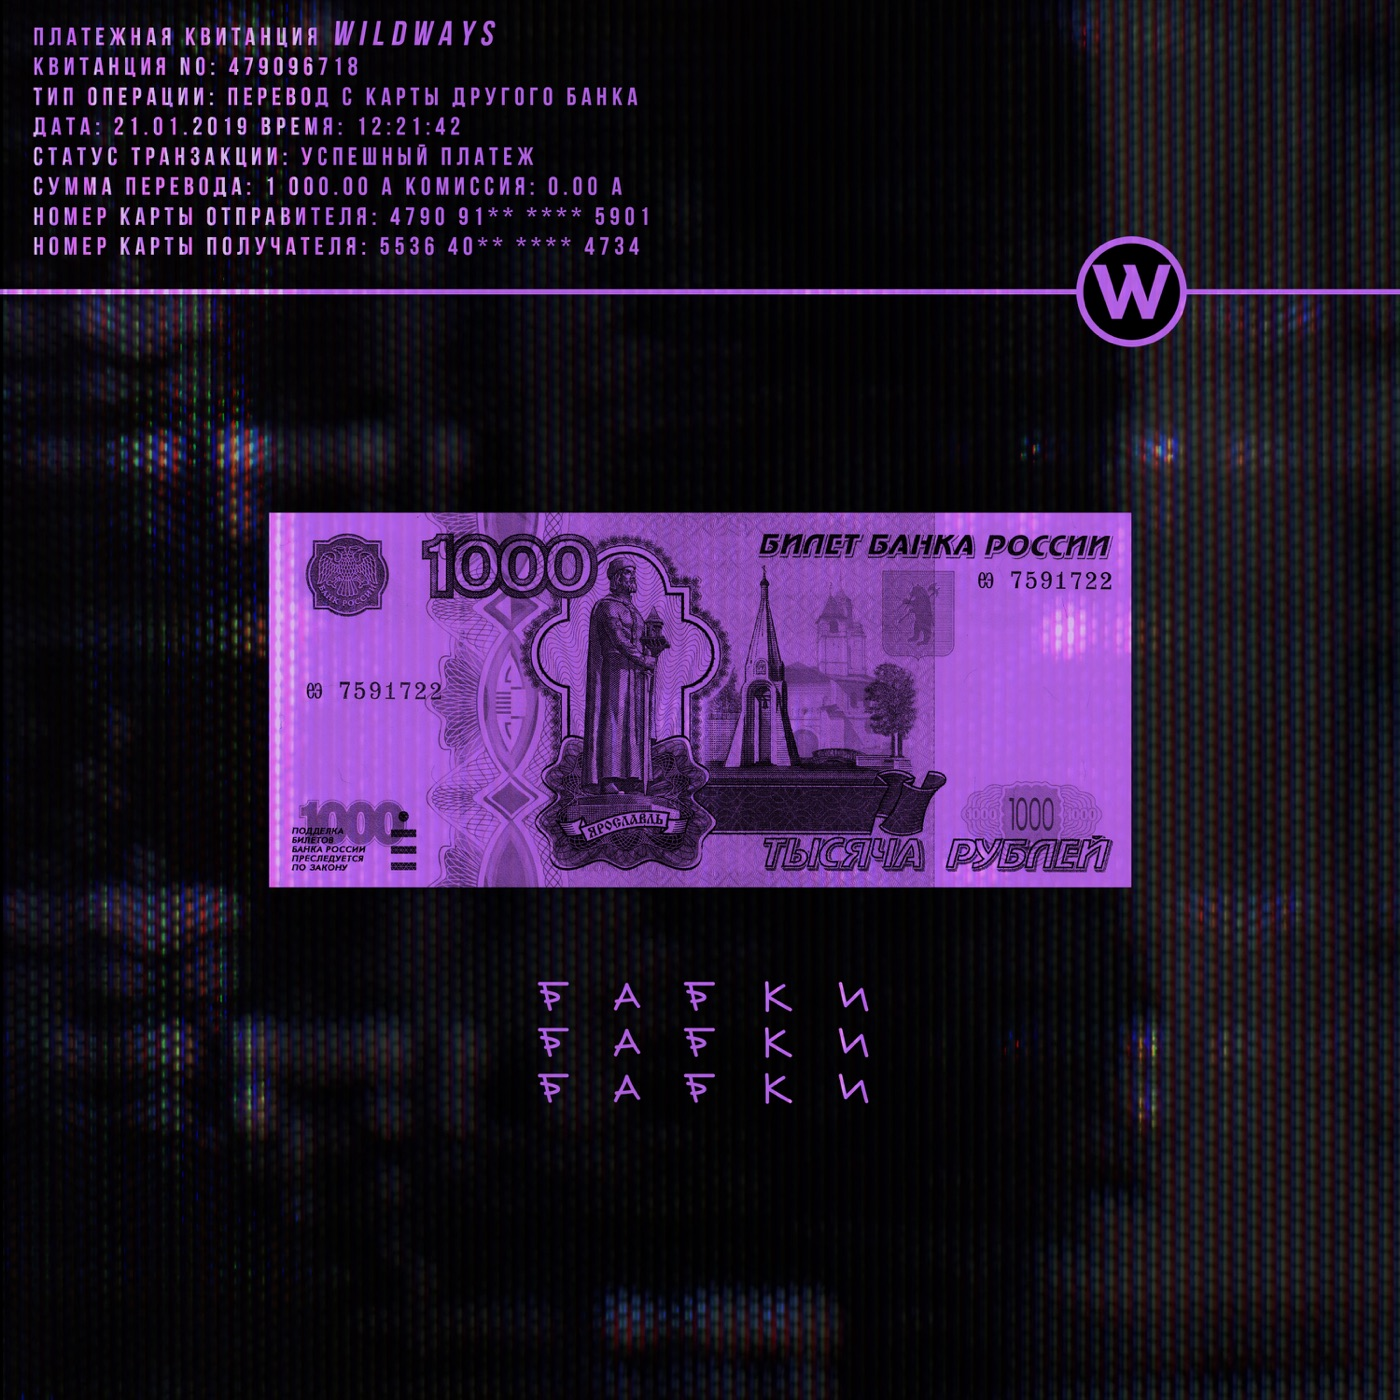 Wildways - Бабкибабкибабки [single] (2019)